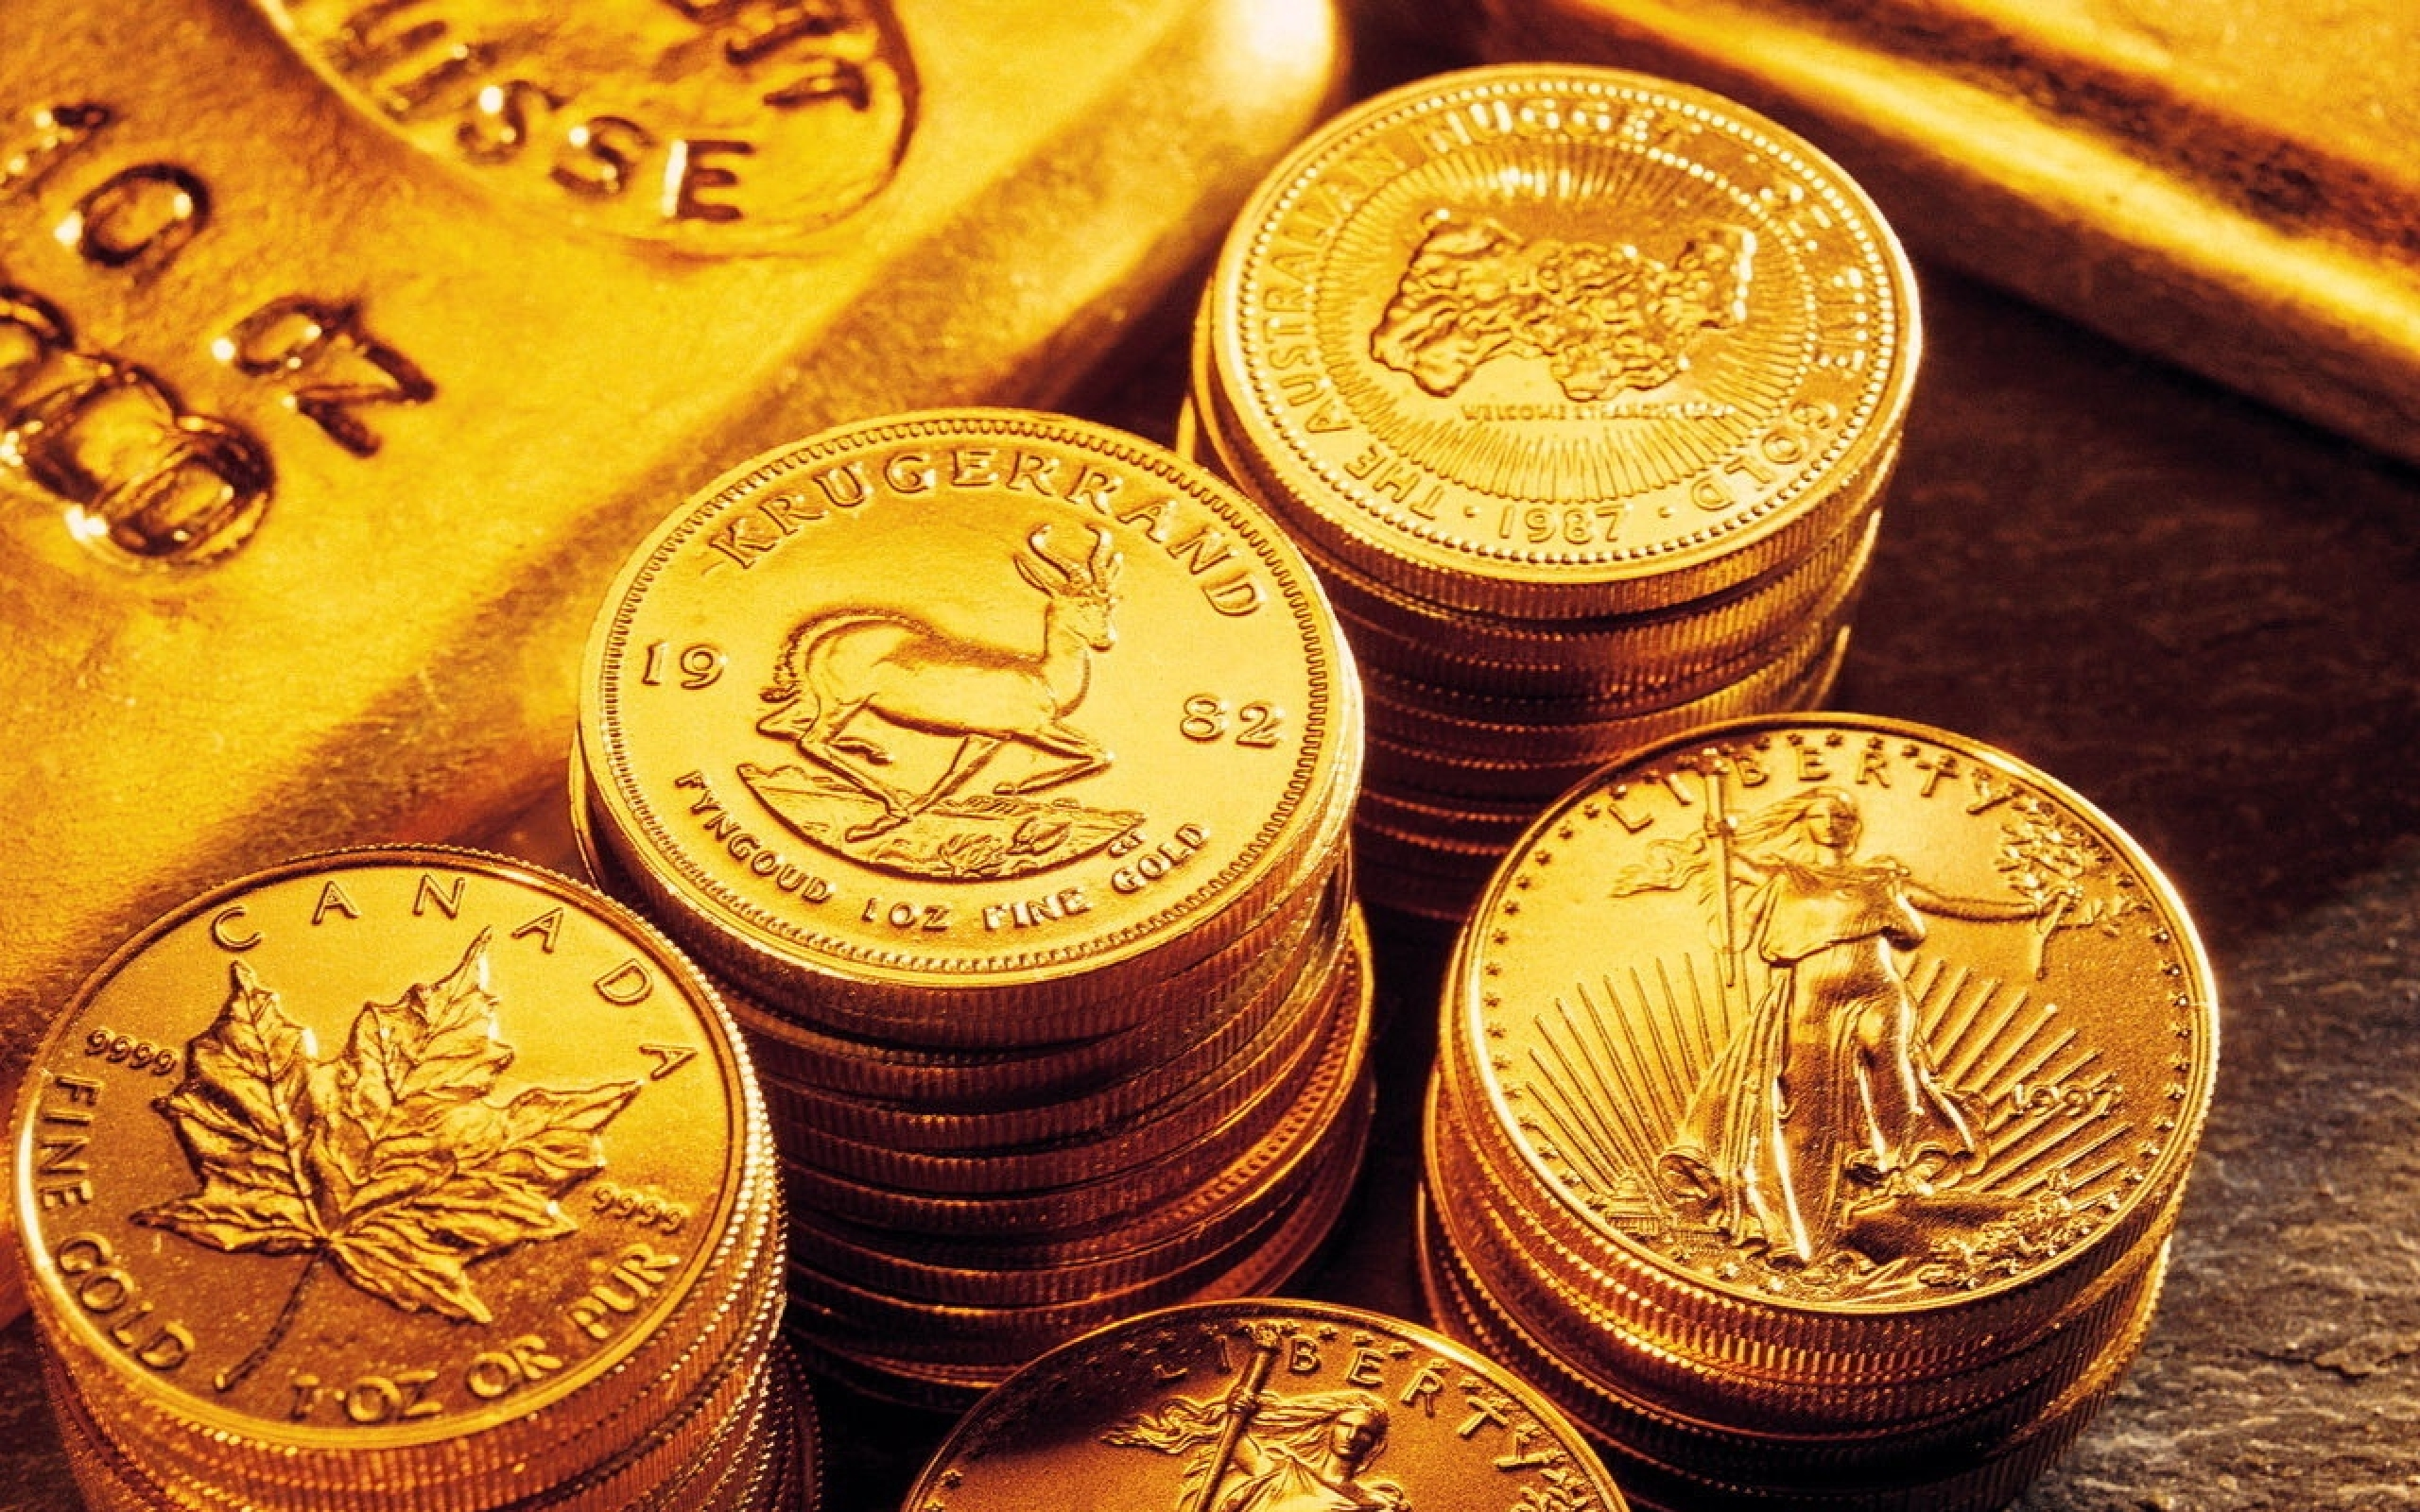 Золото прибавляет в цене на фоне ослабления доллара